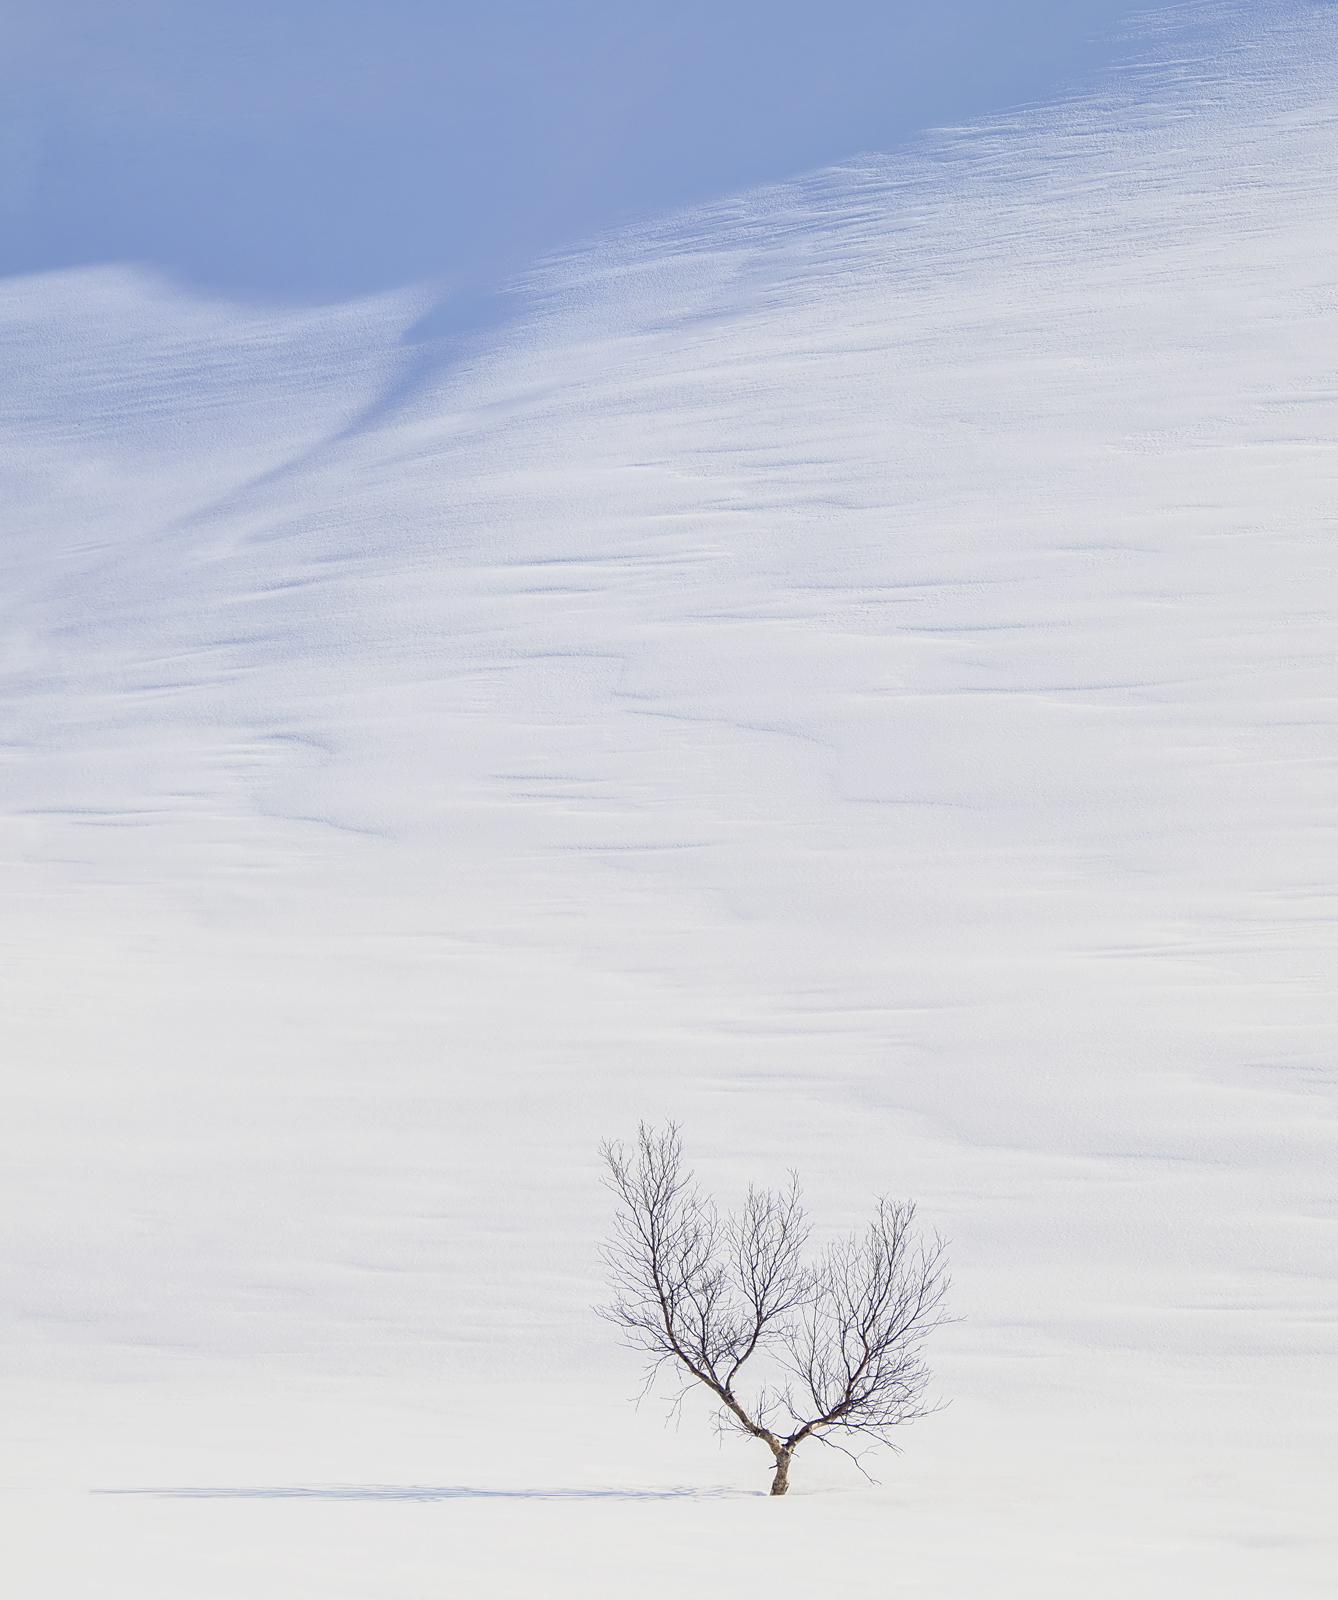 Art Of Snow 6, Anderdalen Nat Park, Senja, Norway, plateau, mountainous, purity, spurious, purity, blue, shadows,, photo